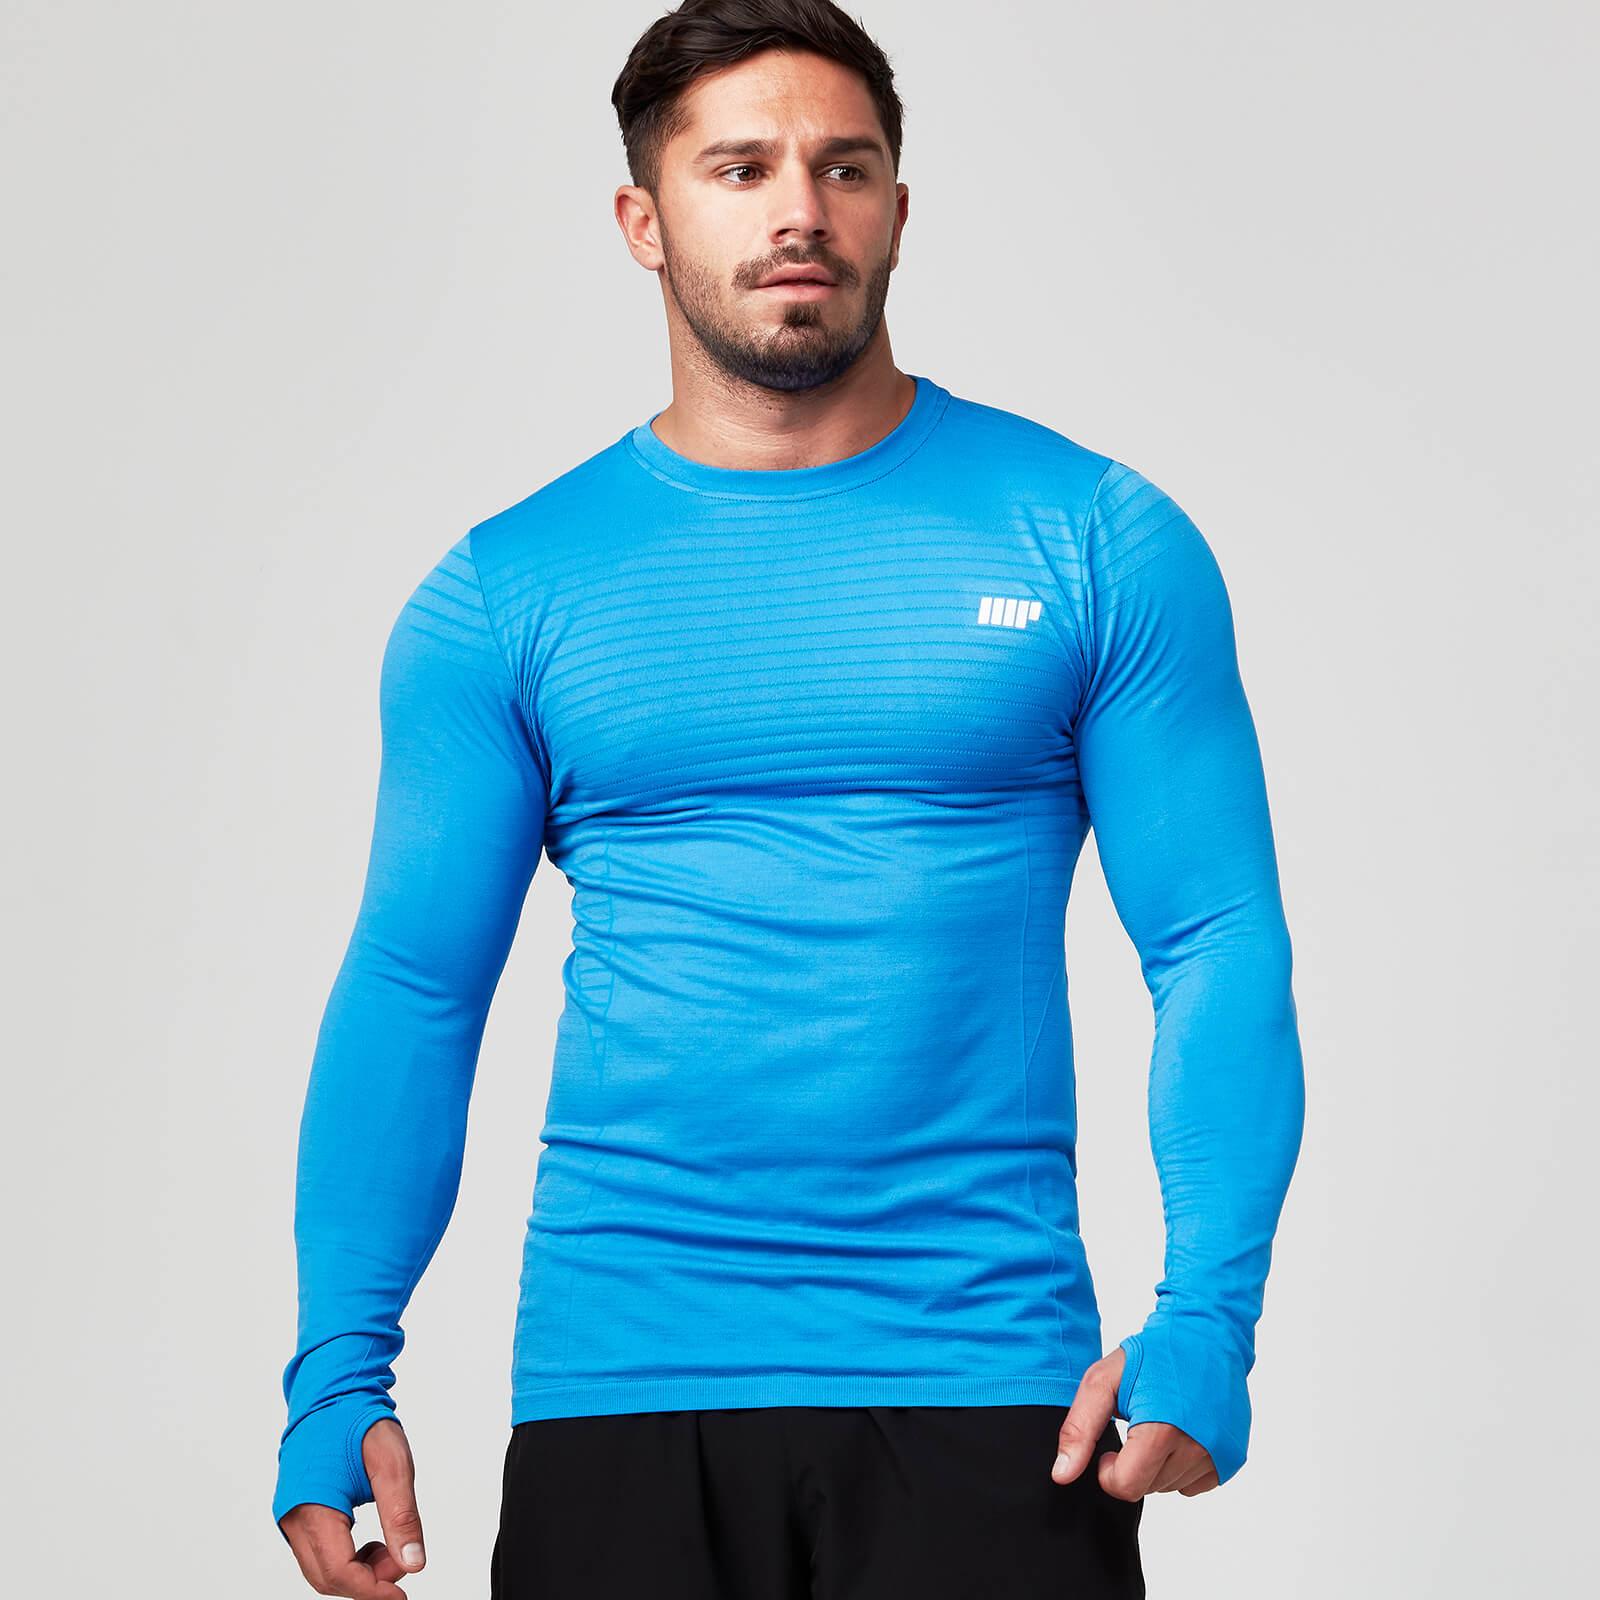 Myprotein Pro-Tech Shorts 2.0 - L - Blå